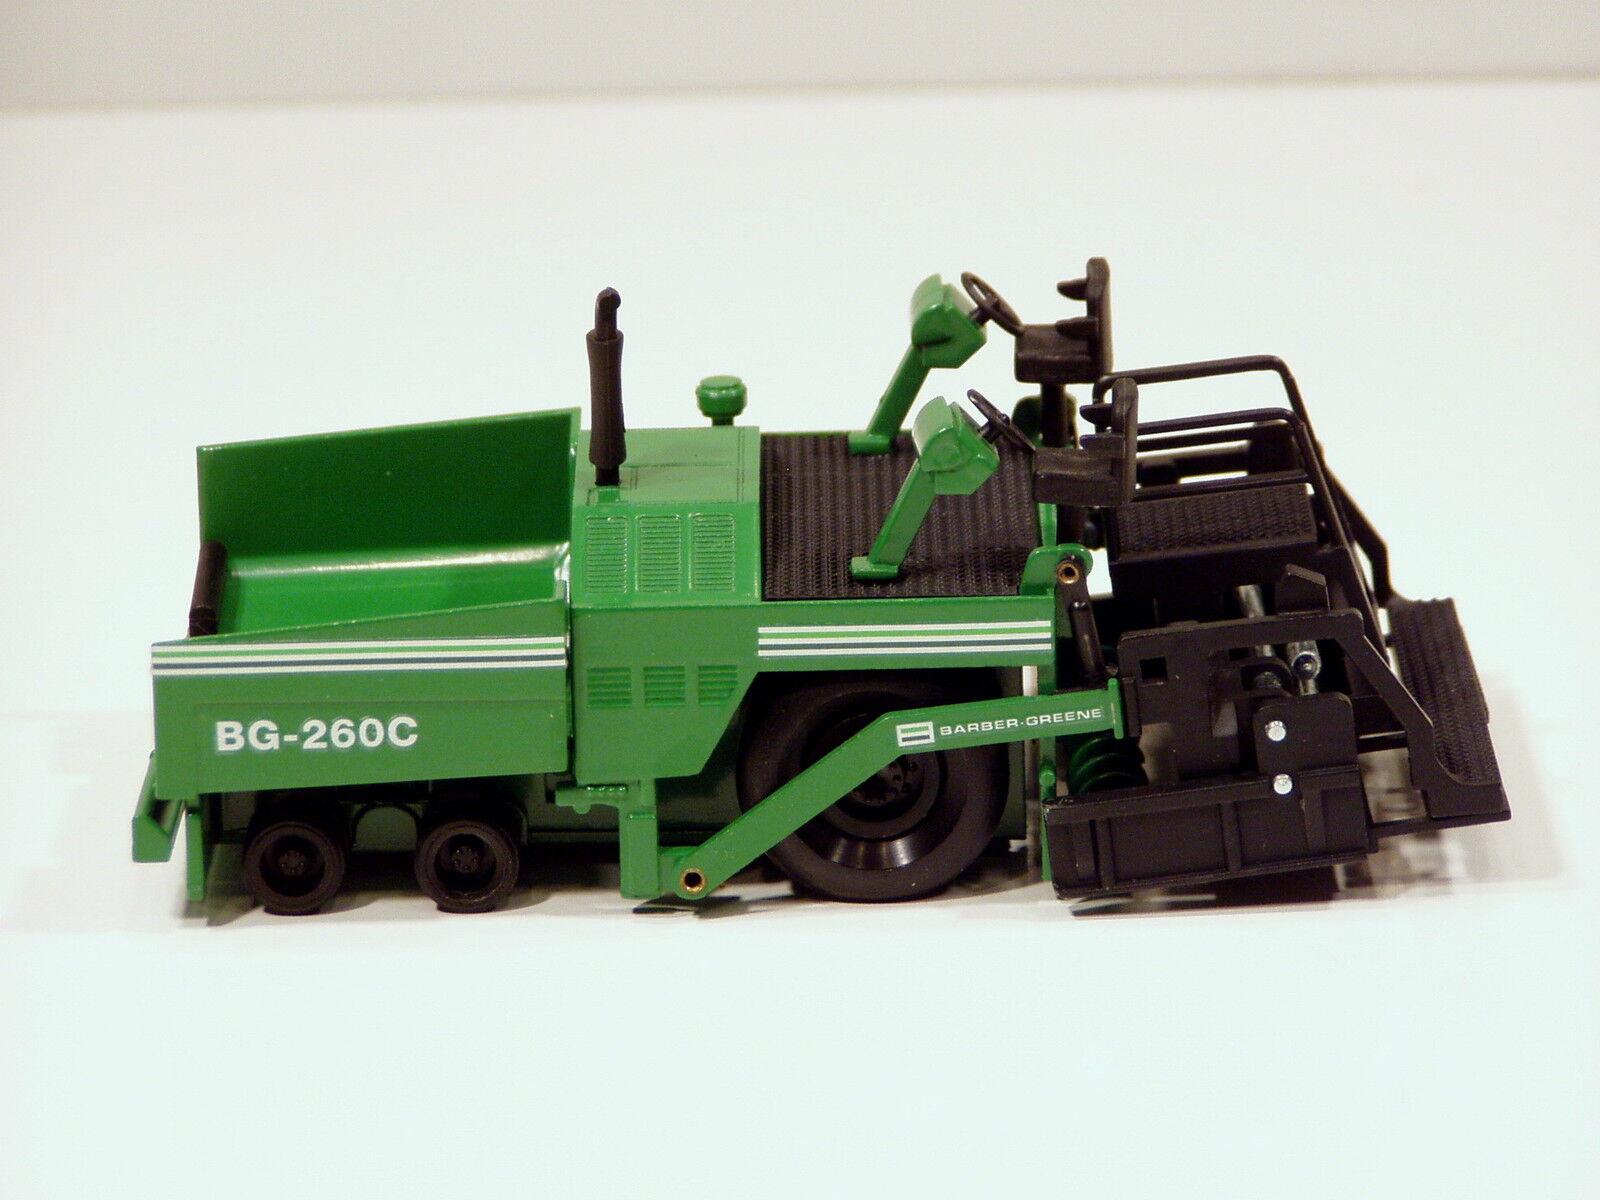 Barber Greene BG260C Paver - 1 50 50 50 - NZG MIB d82538